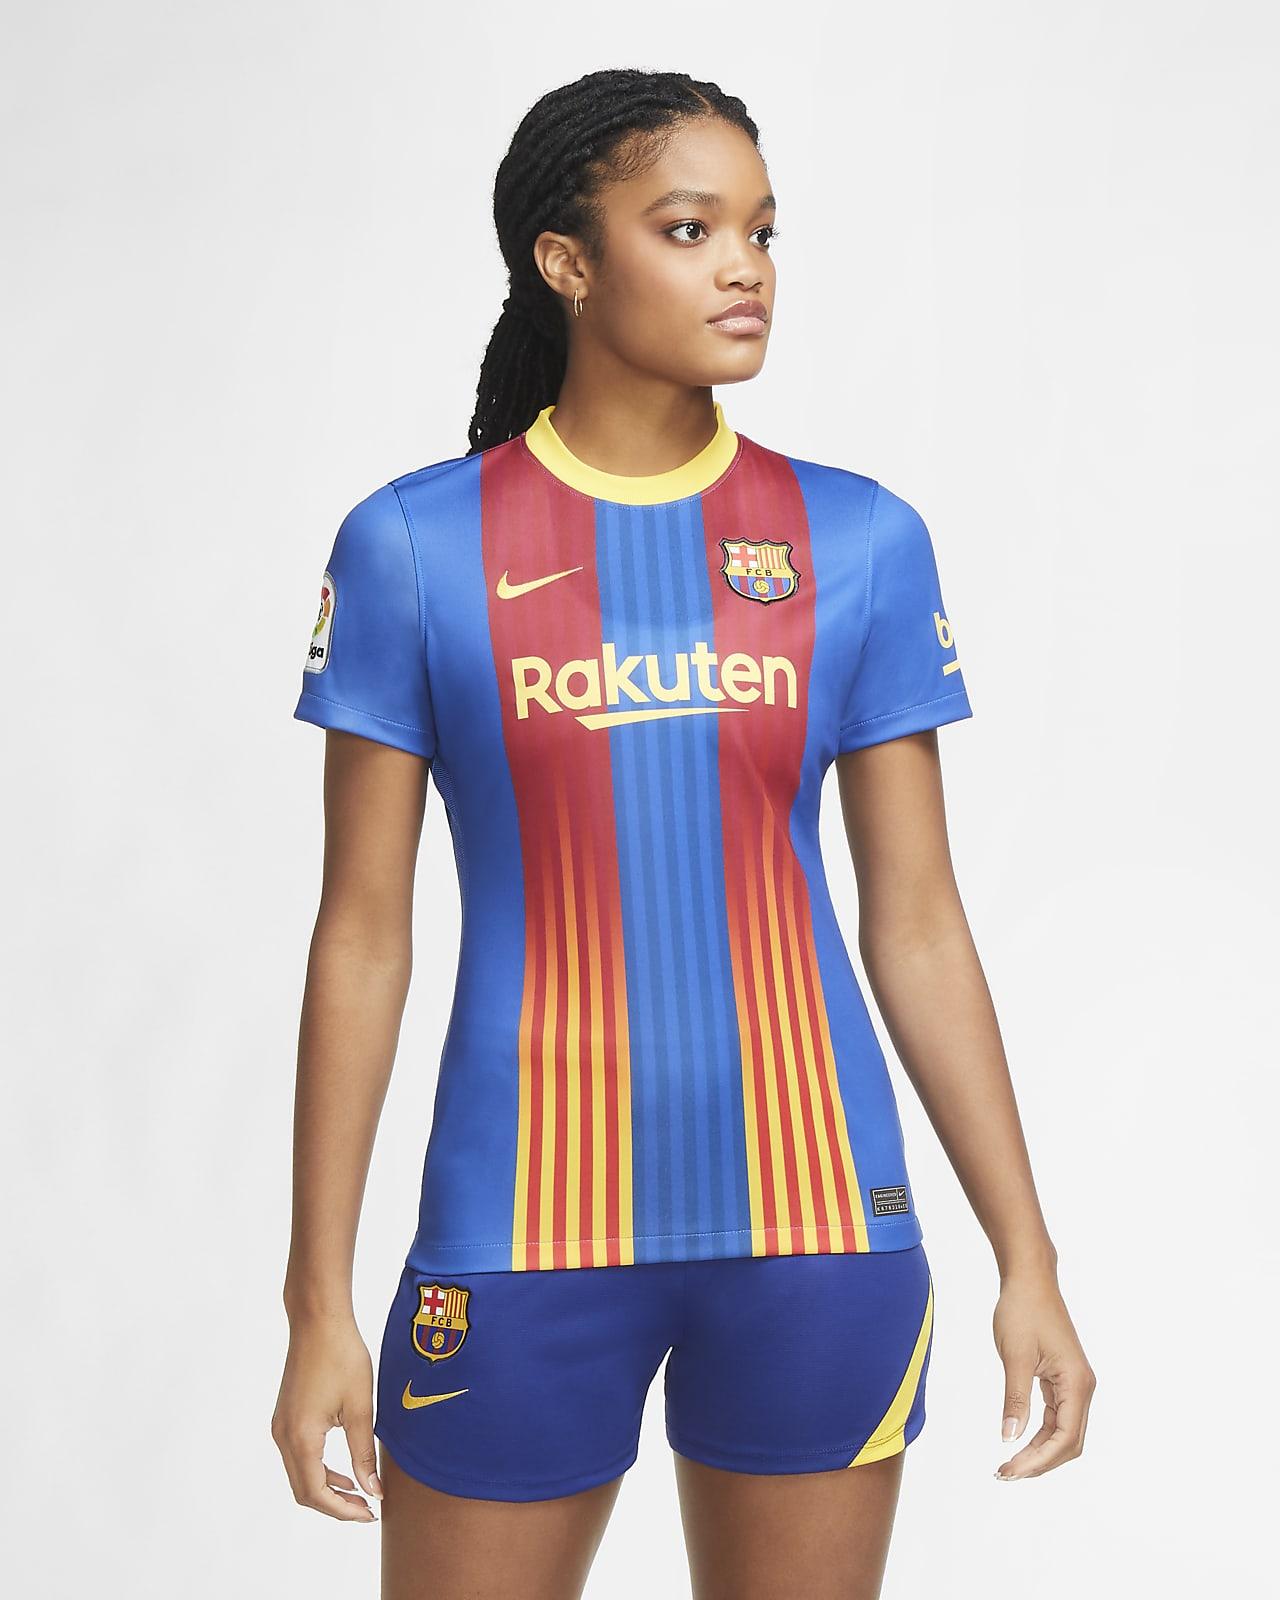 Maillot de football FC Barcelona 2020/21 Stadium pour Femme